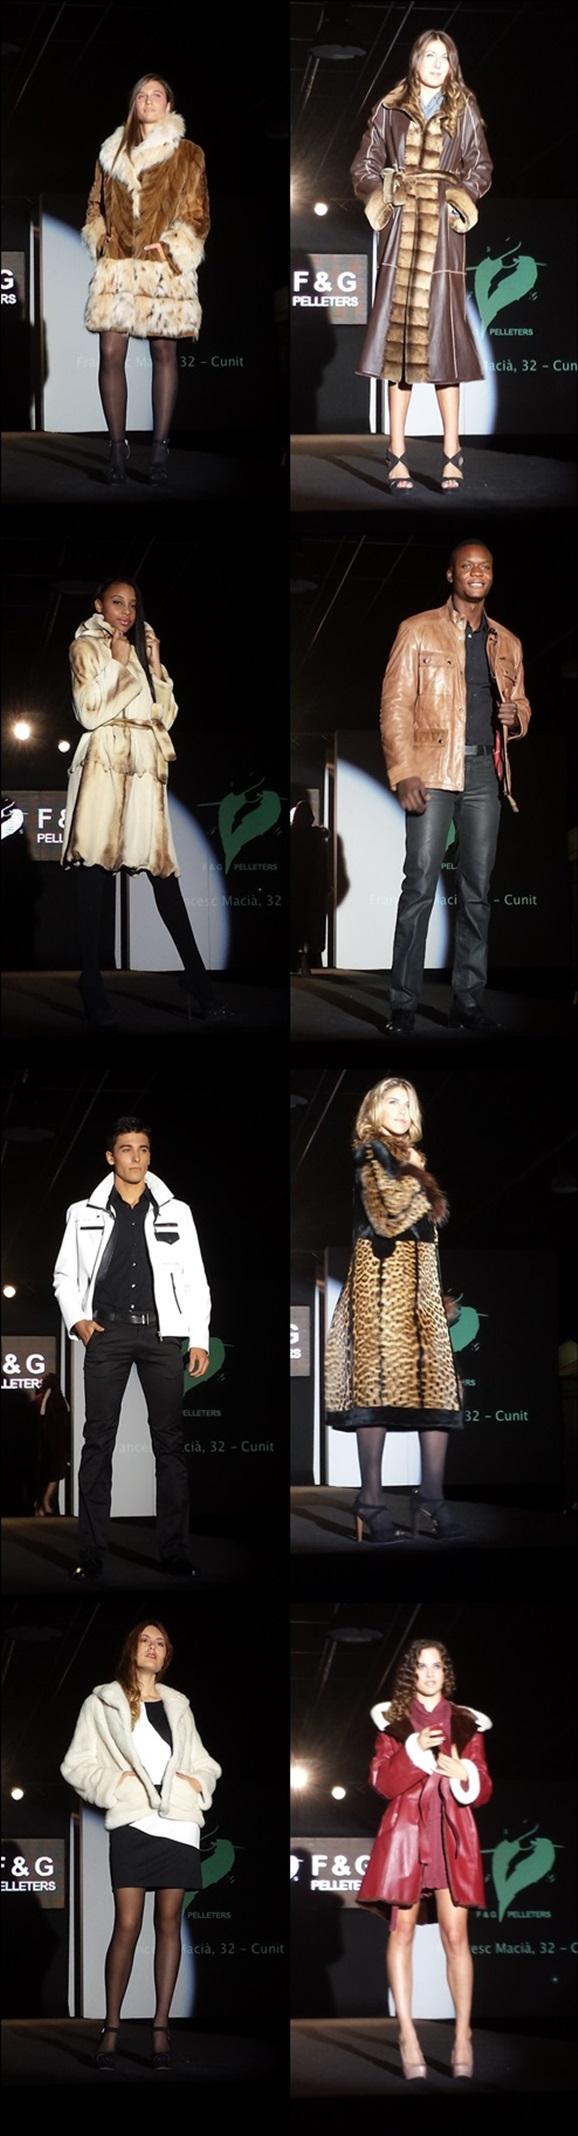 Reus Fashion Festival pieles